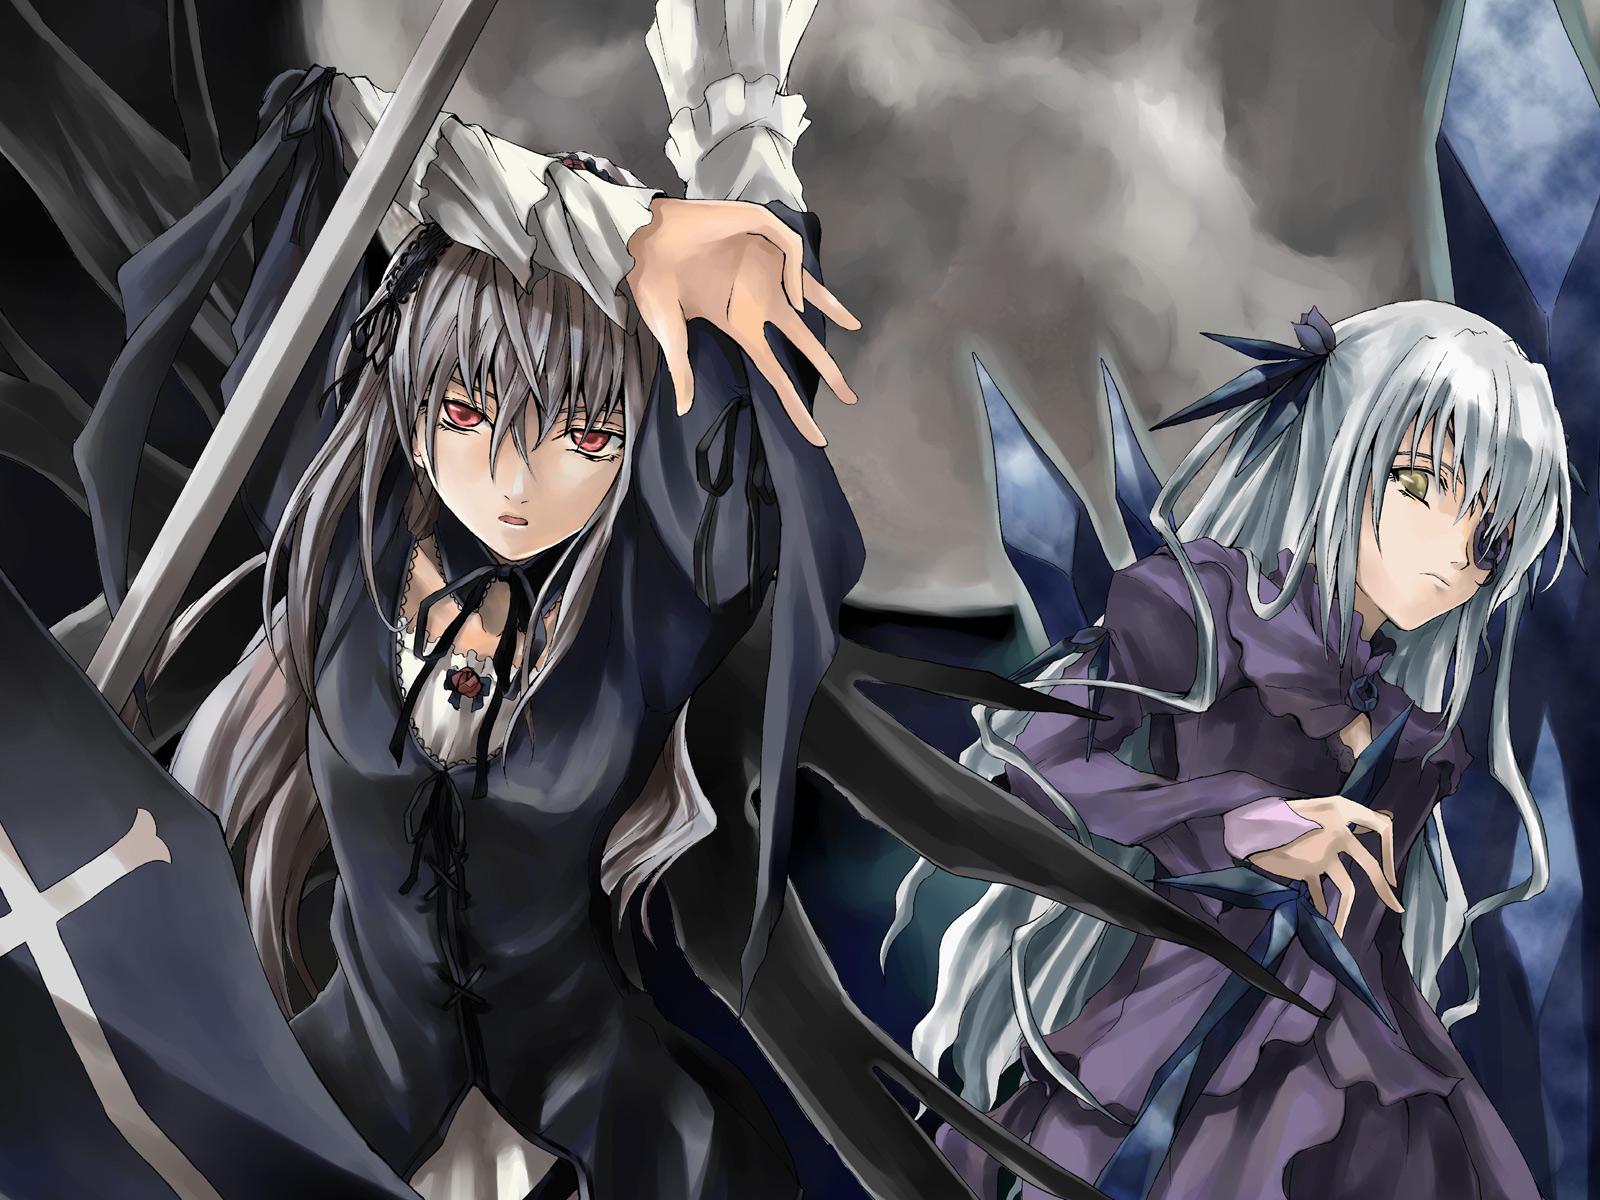 Konachan.com - 33668 barasuishou eyepatch gothic rozen_maiden suigintou